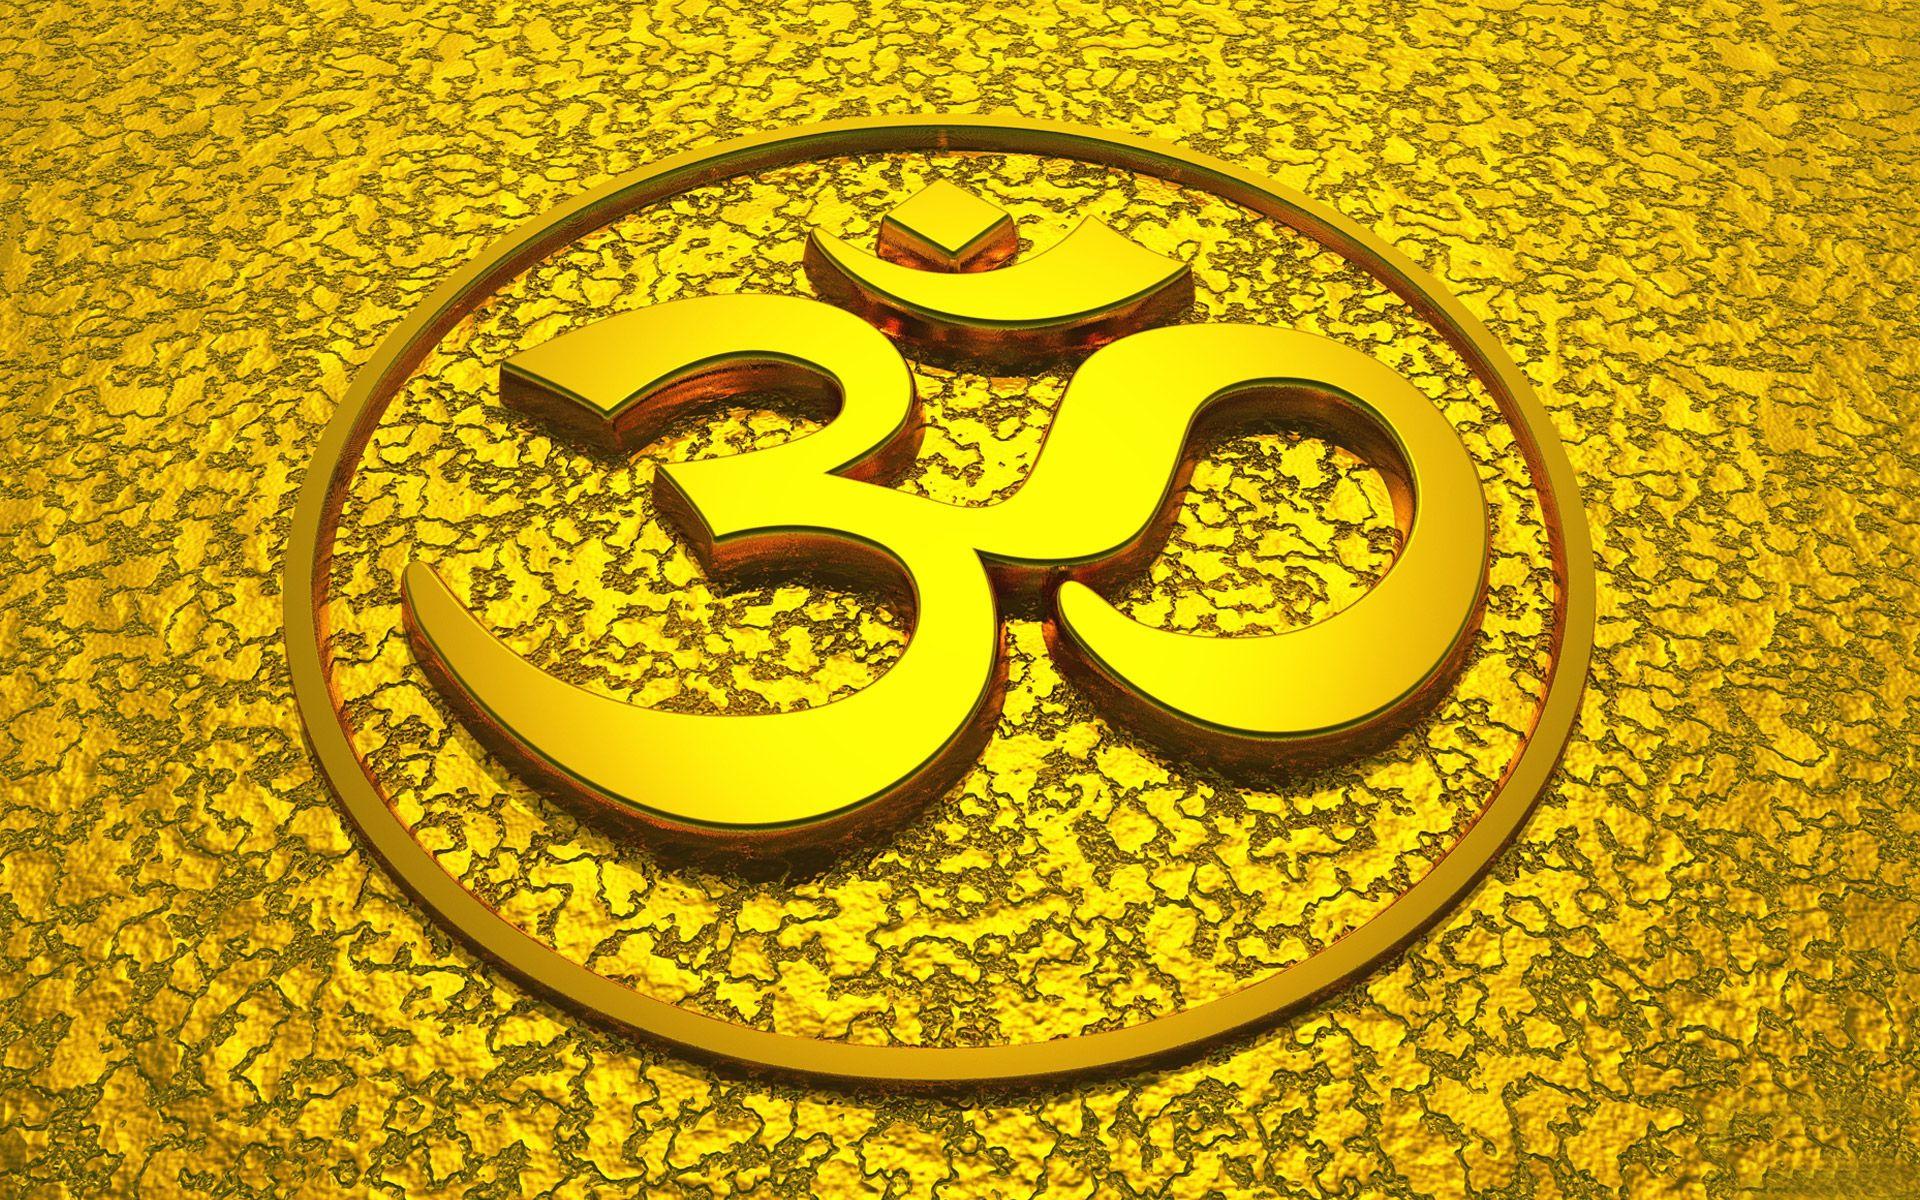 Om hindu god symbol in yellowg 19201200 india pinterest hindu symbols biocorpaavc Image collections